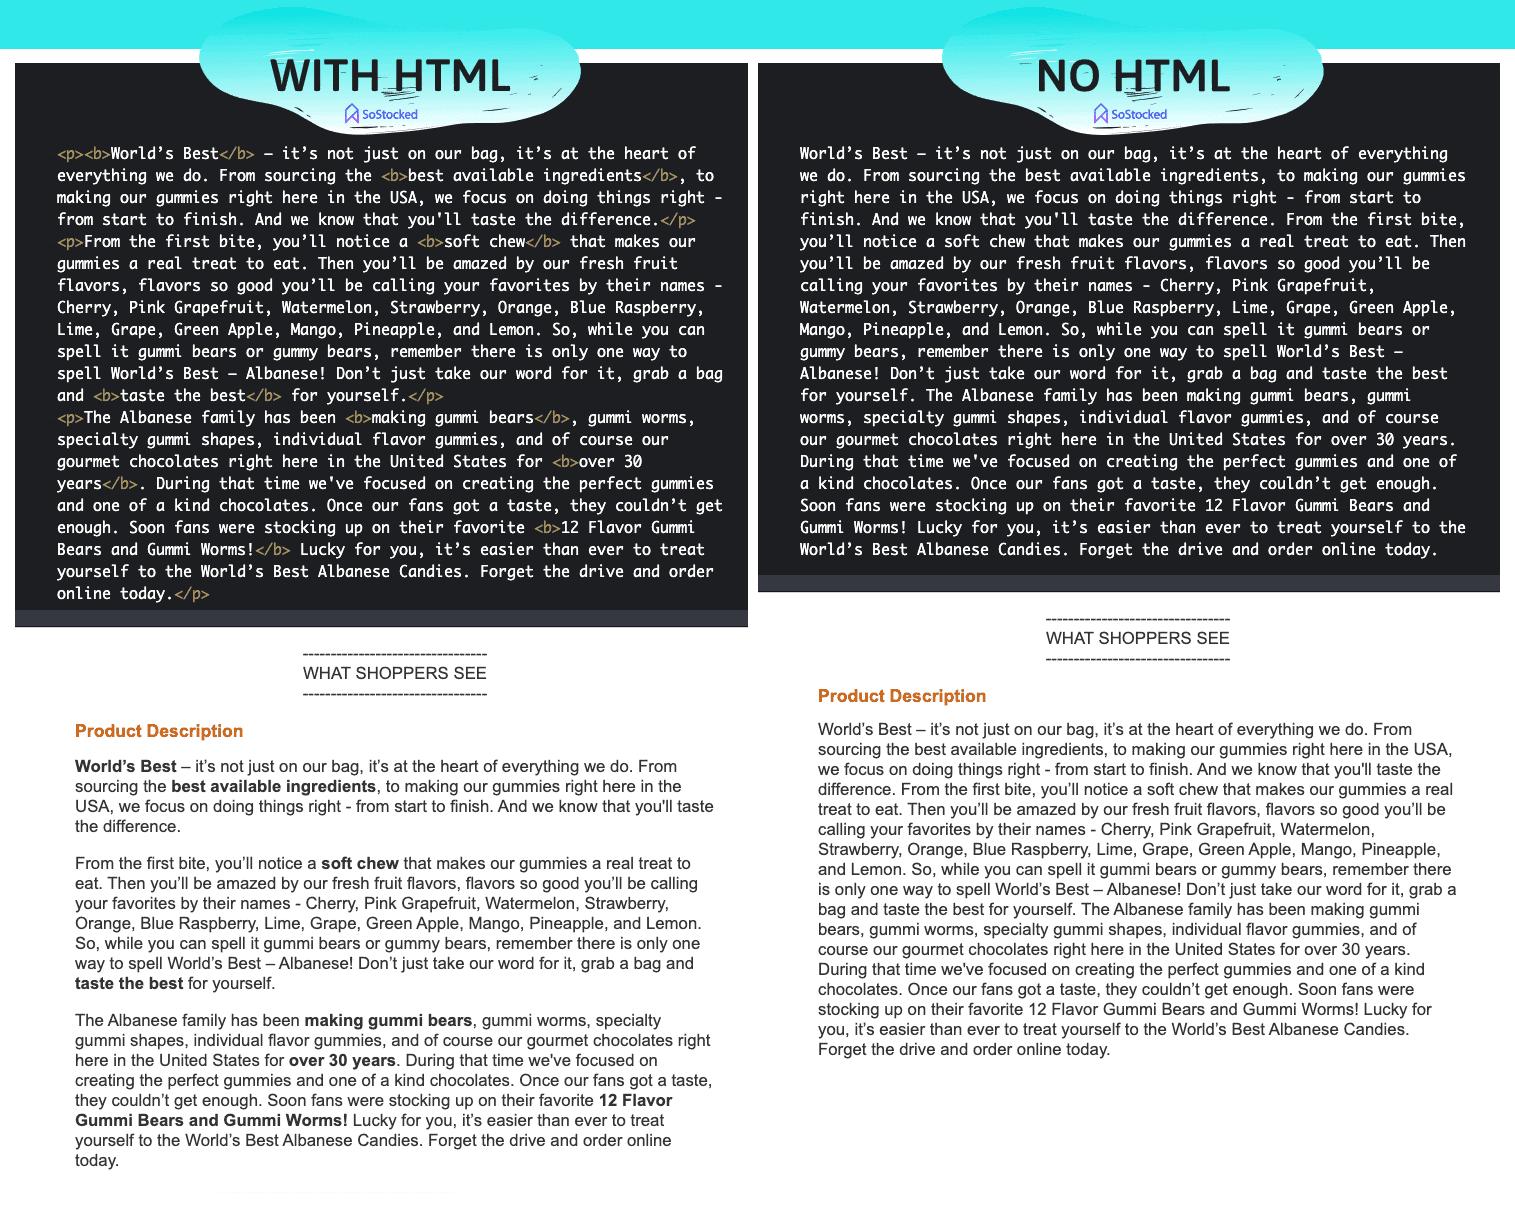 Amazon Product Description HTML versus No HTML